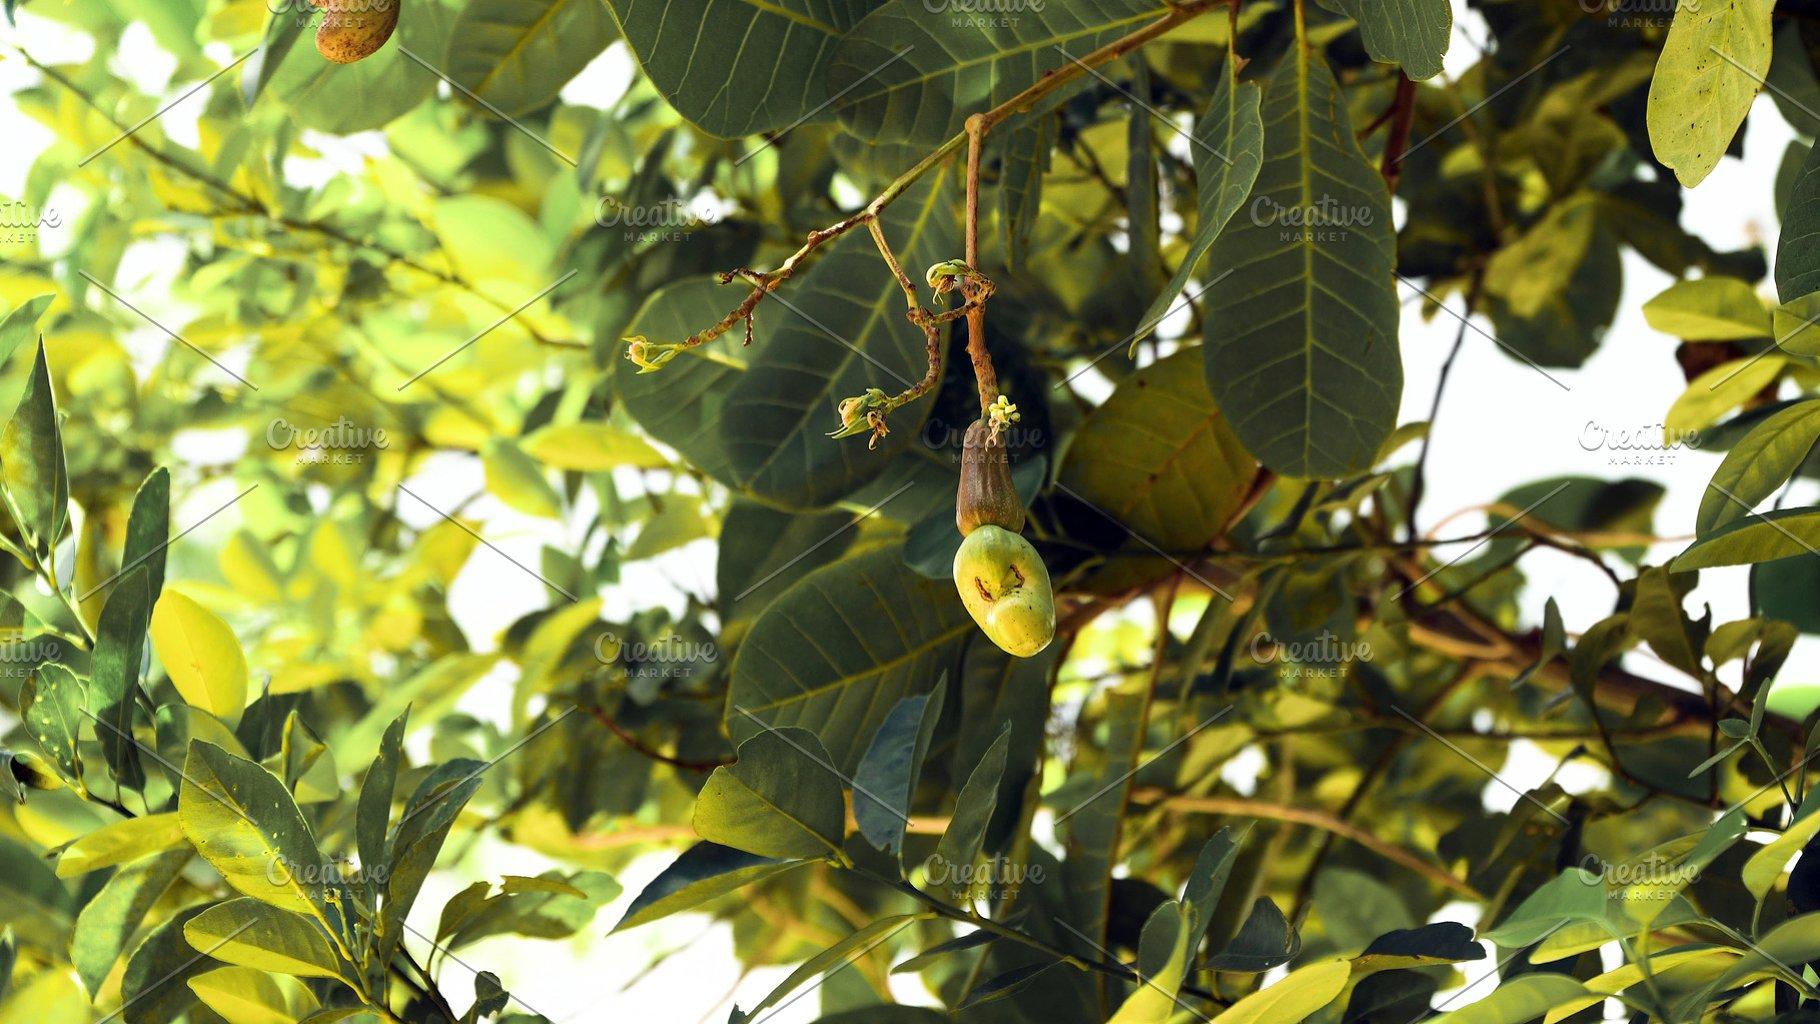 Nut Tree Cashew Growing Nuts  Busuanga, Palawan, Philippines